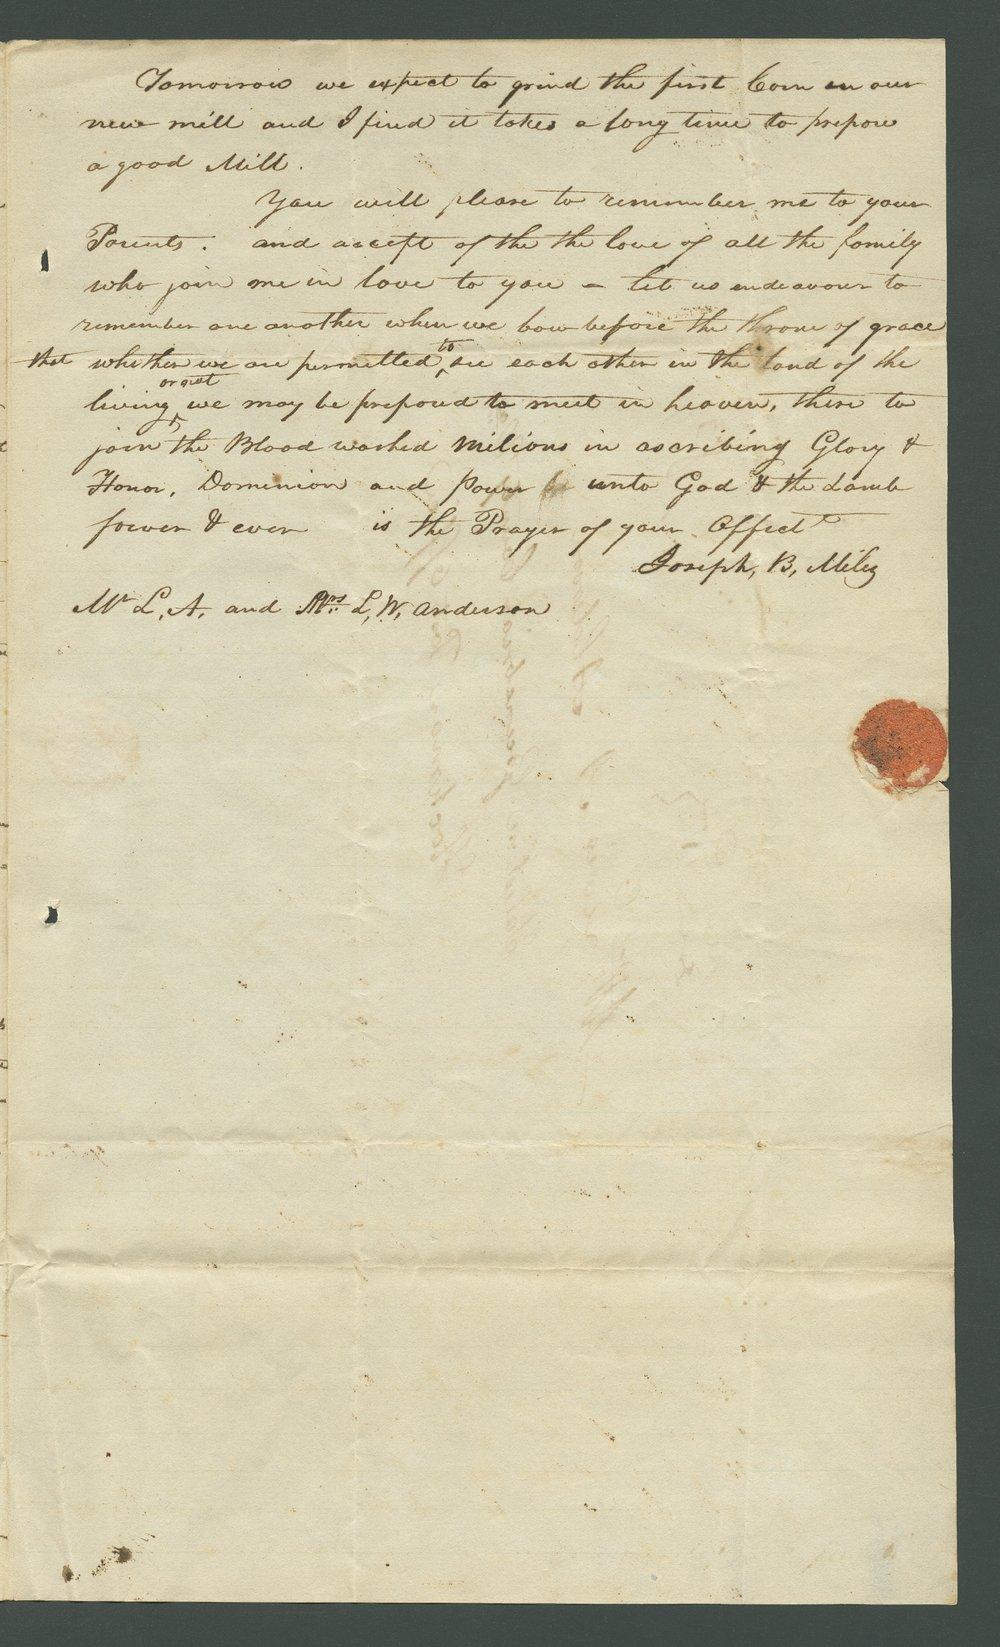 Joseph B. Miles to Lewis Allen Alderson - 6